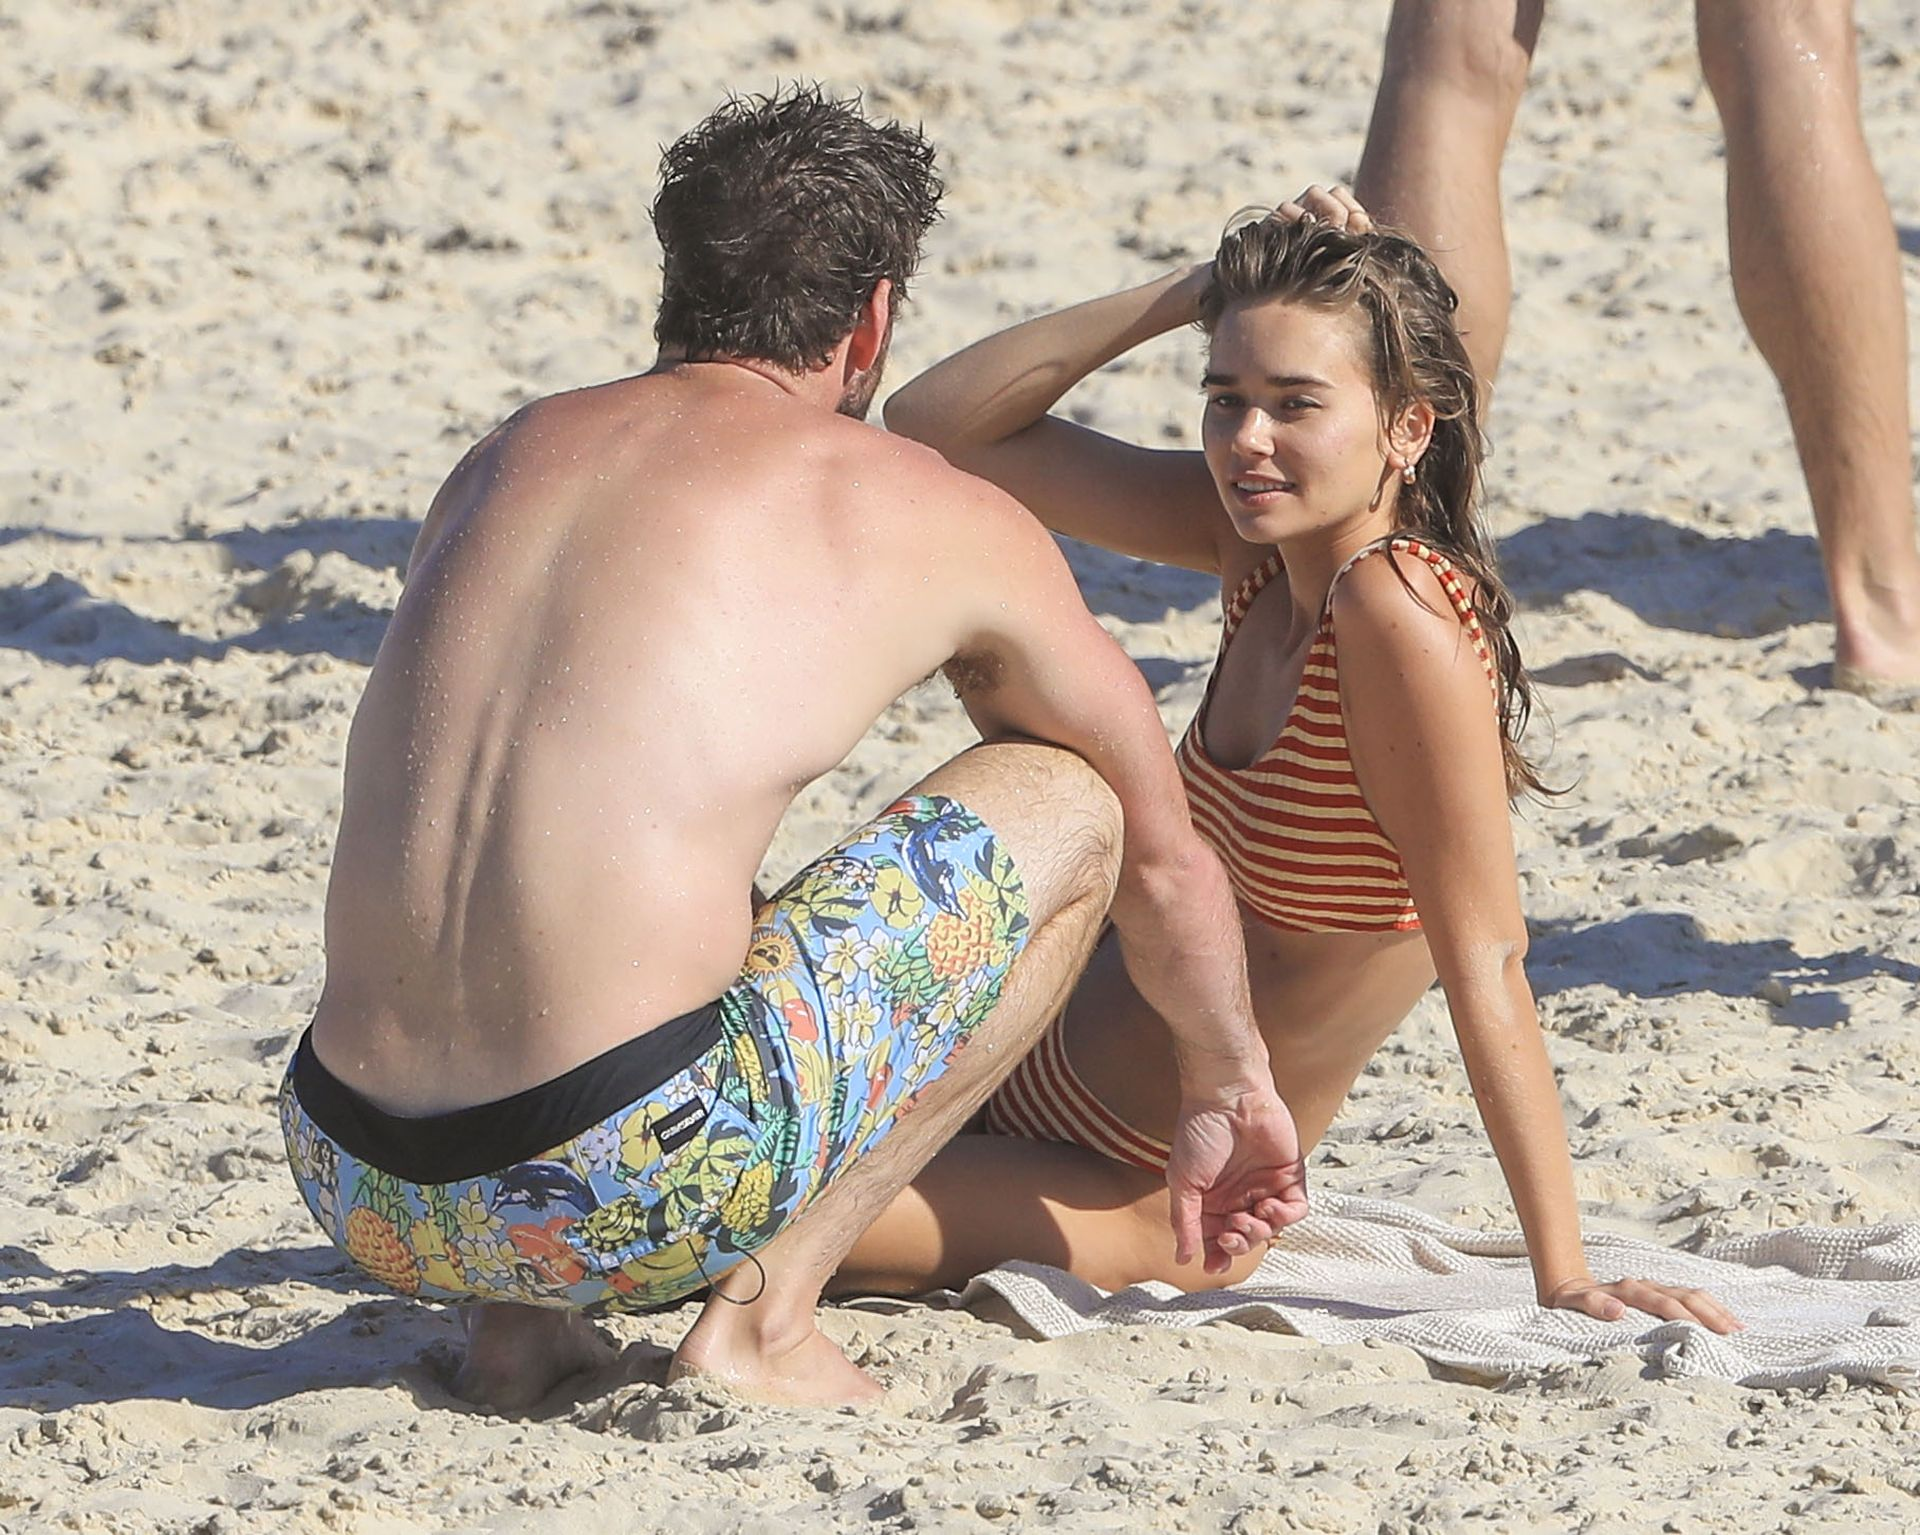 Gabriella Brooks Hot – Liam Hemsworth's New Girlfriend 0007